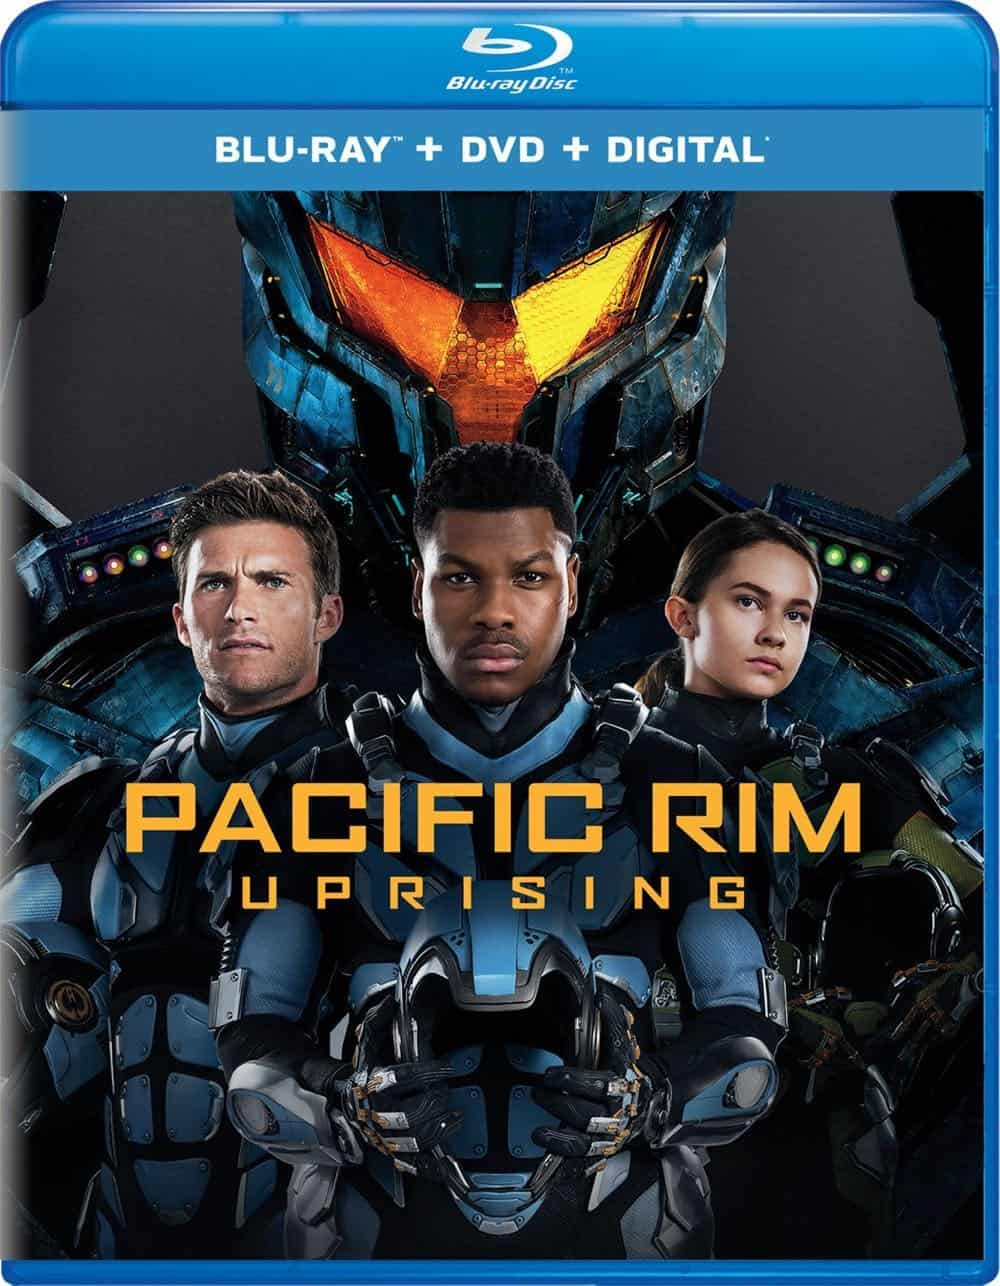 Pacific Rim Uprising Blu-ray DVD Digital Cover